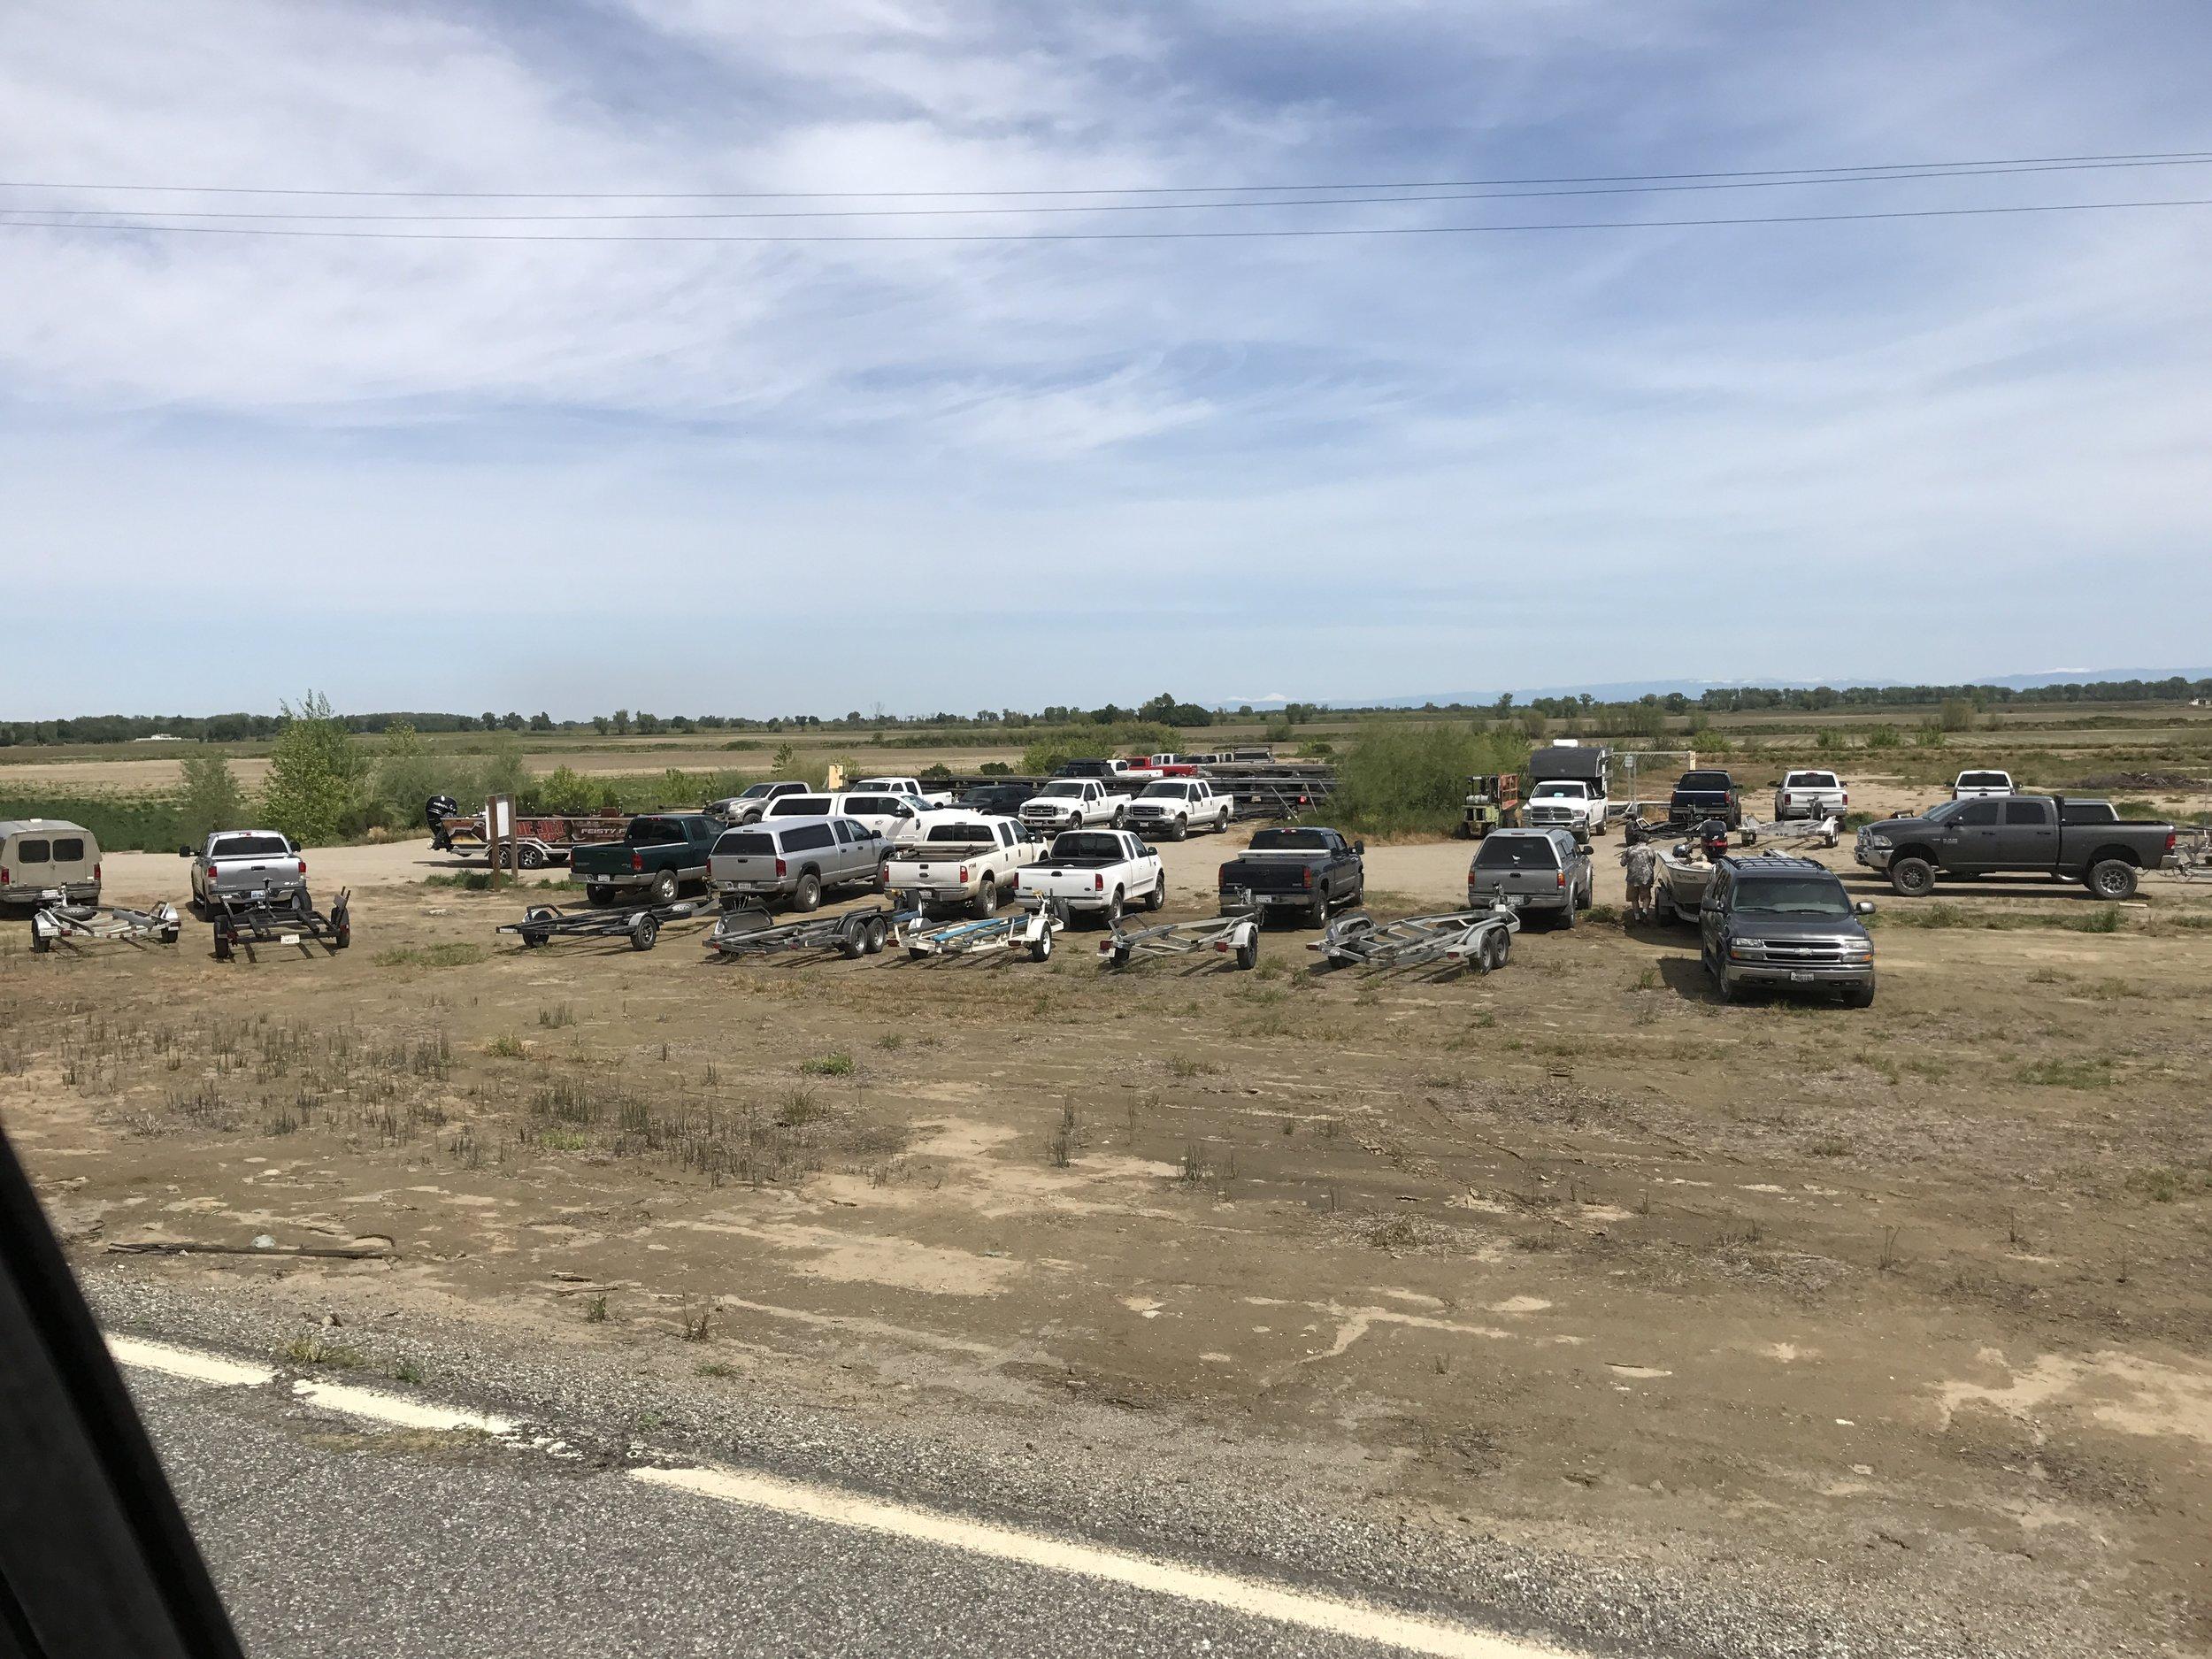 Parking lot at Steelhead Lodge  colusalanding.com on Saturday April 15, 2017 in Colusa, Ca on the Sacramento River.